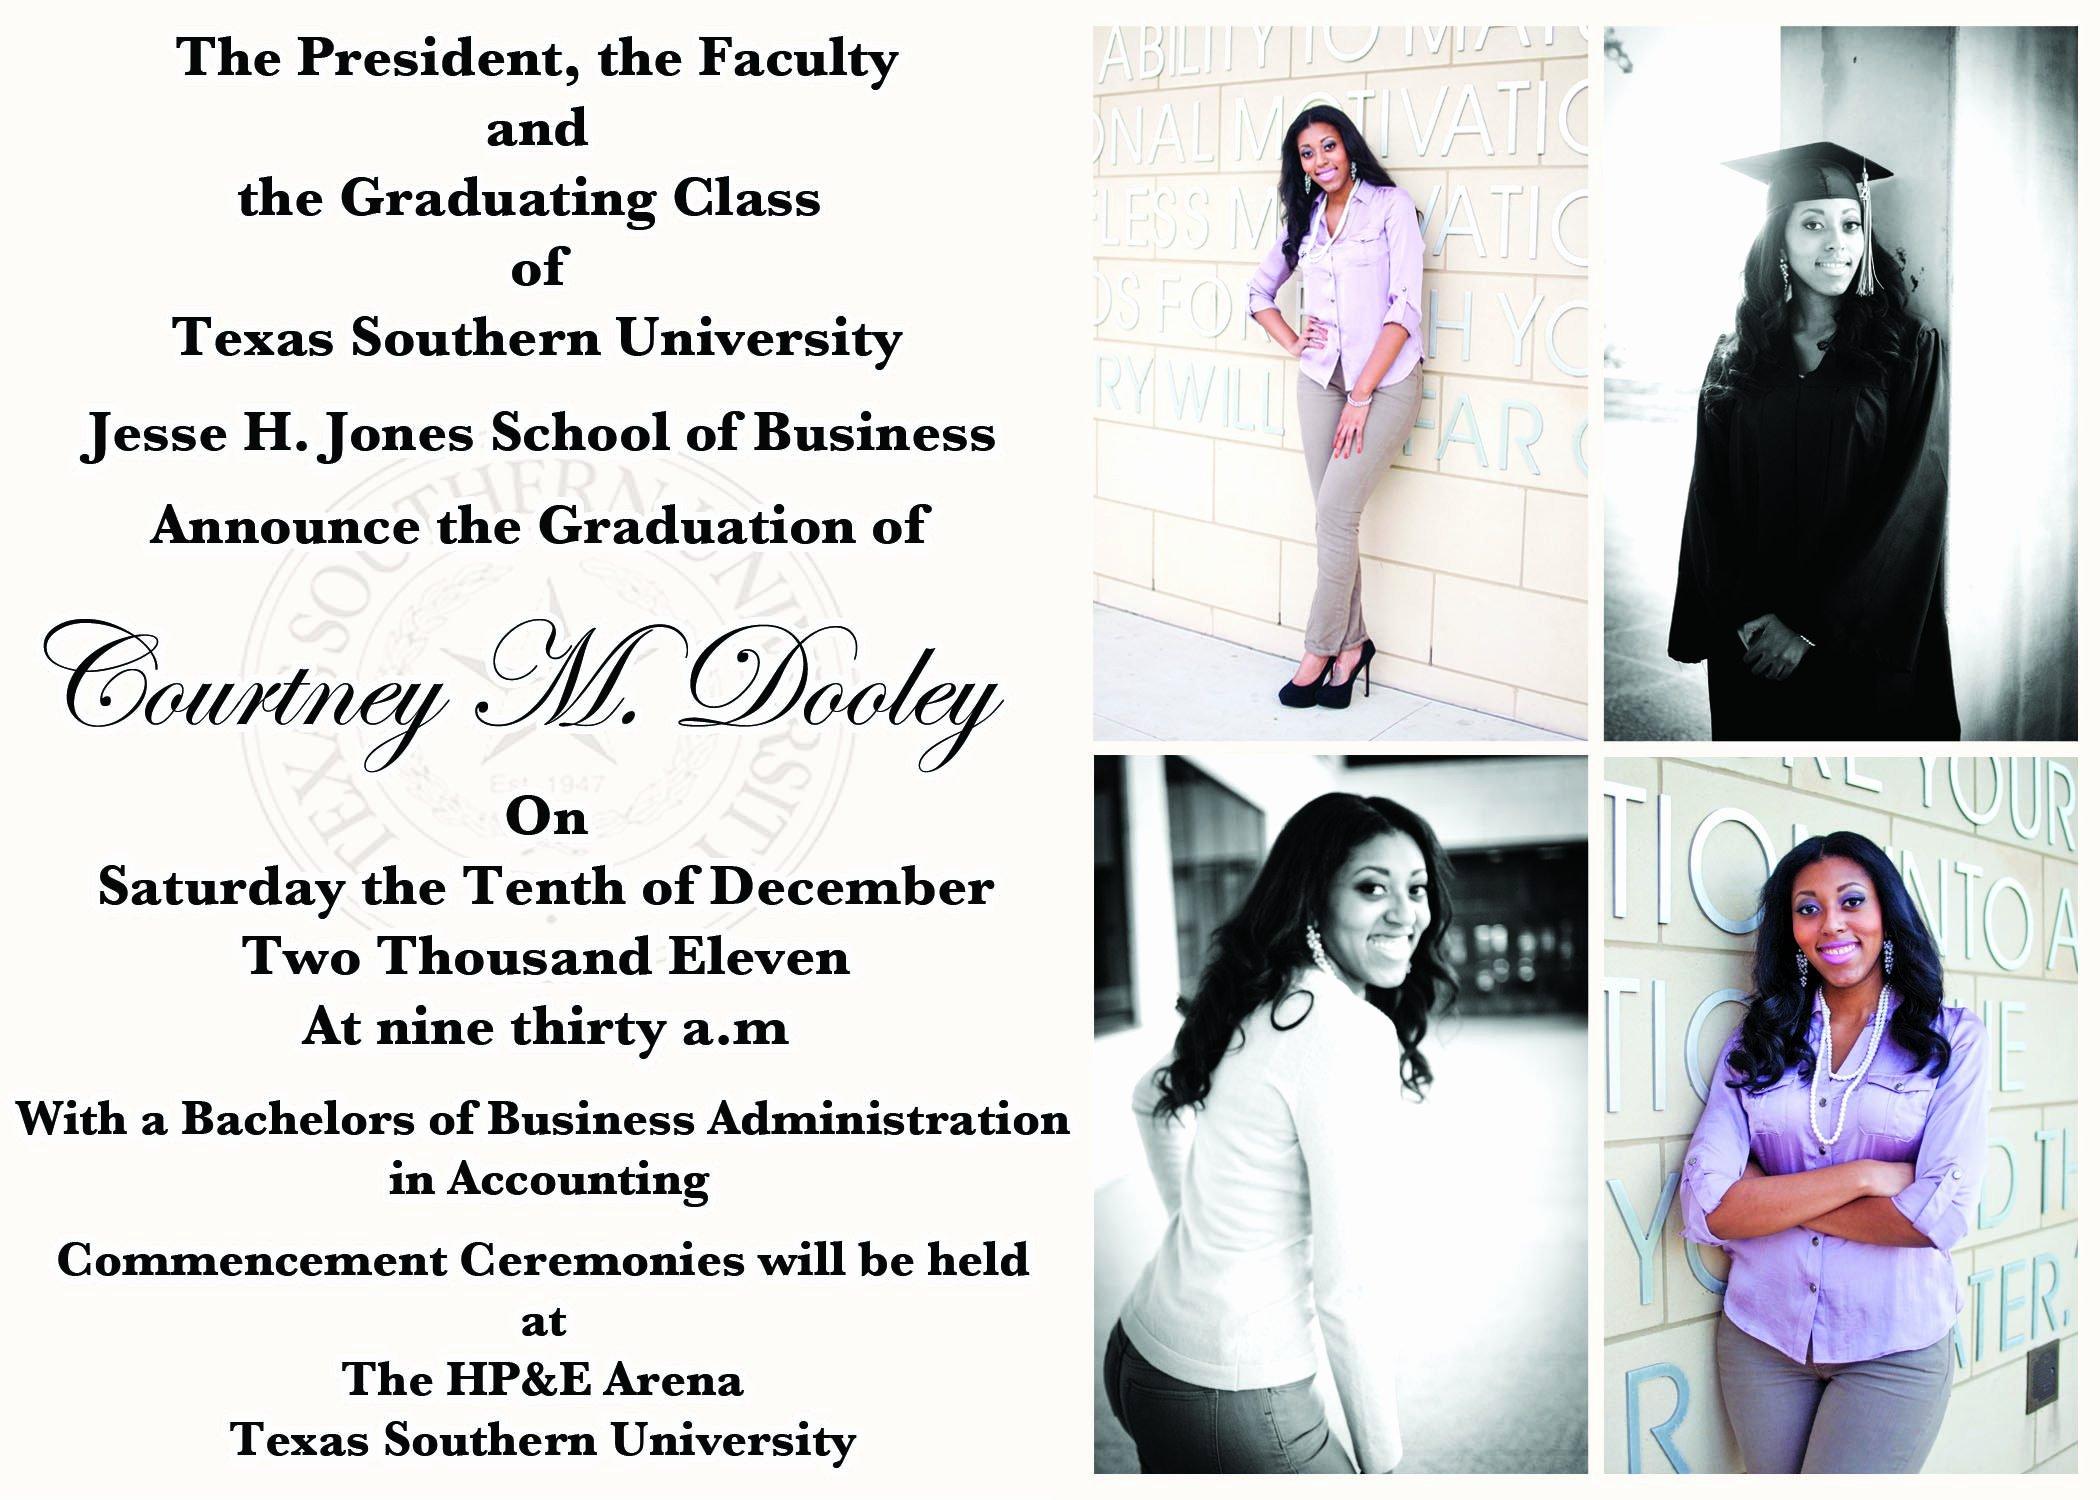 Graduation Invitation Templates Microsoft Word Inspirational Graduation Invitation Templates Graduation Ceremony